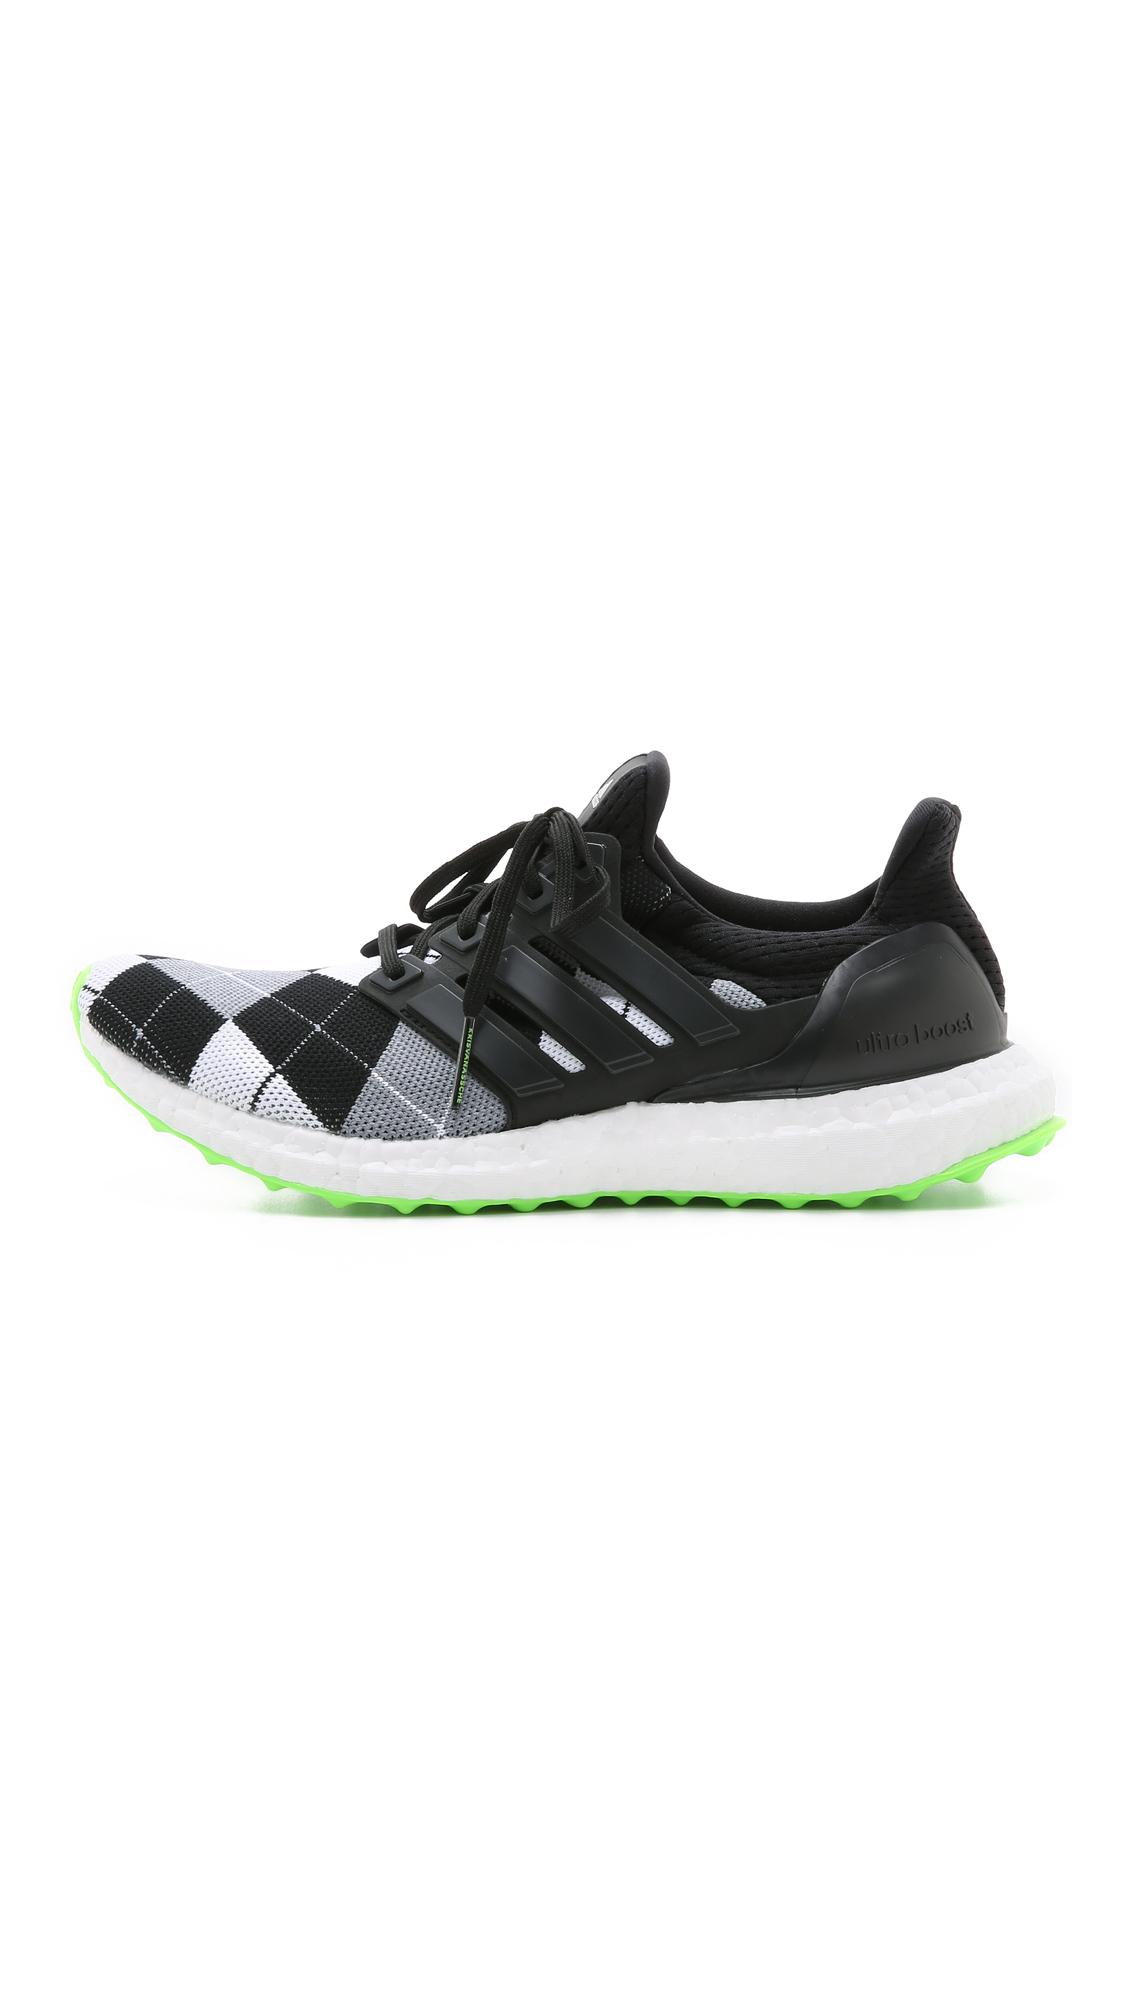 adidas Neoprene Ultra Boost Kva Sneakers - Core Black/grey/solar Green in White